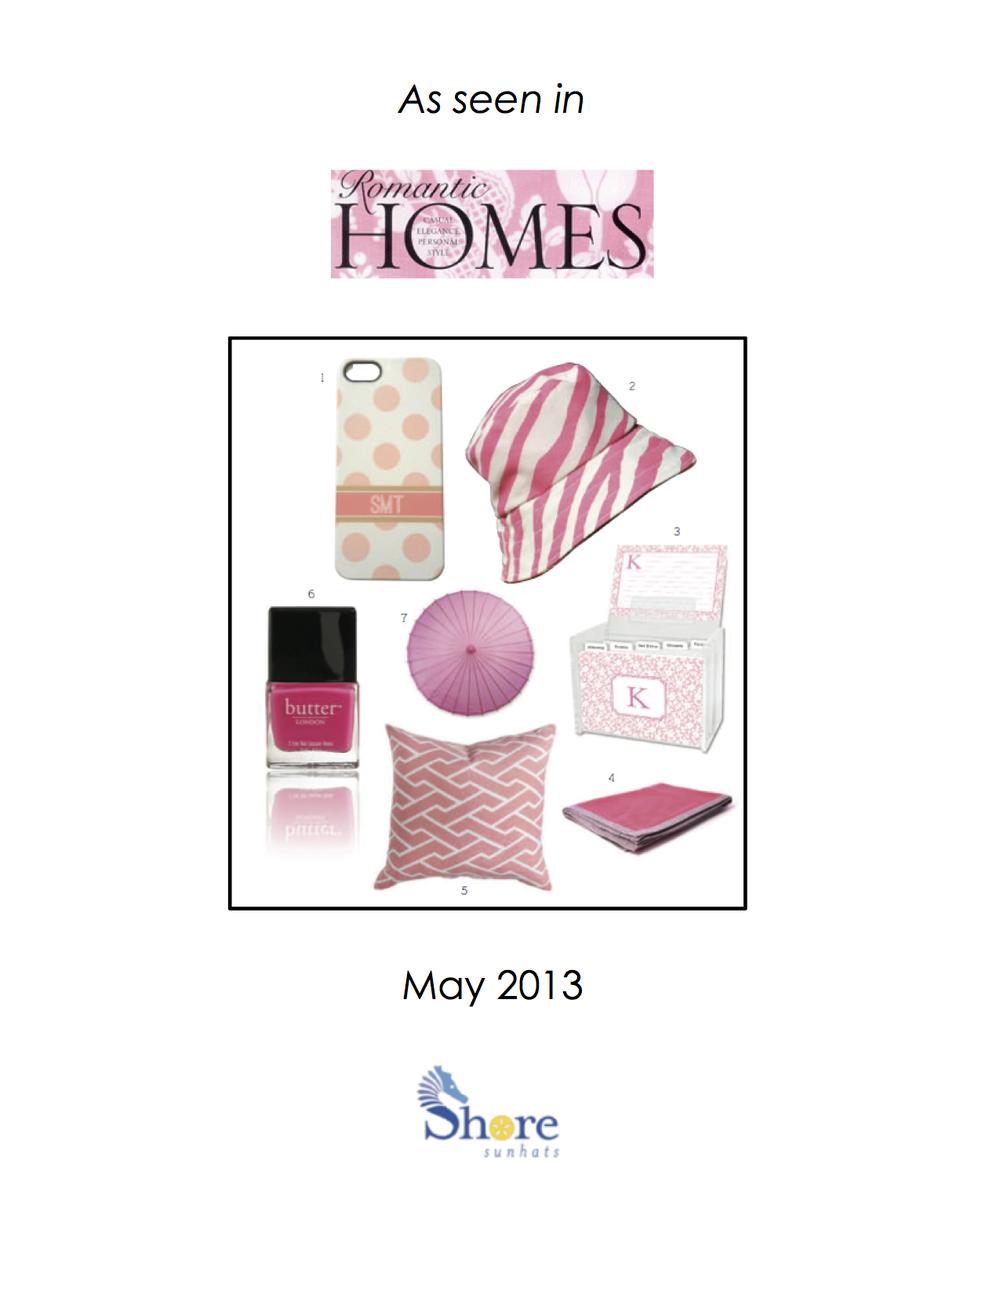 shoresunhats-asseenin-romantichomes2.jpg